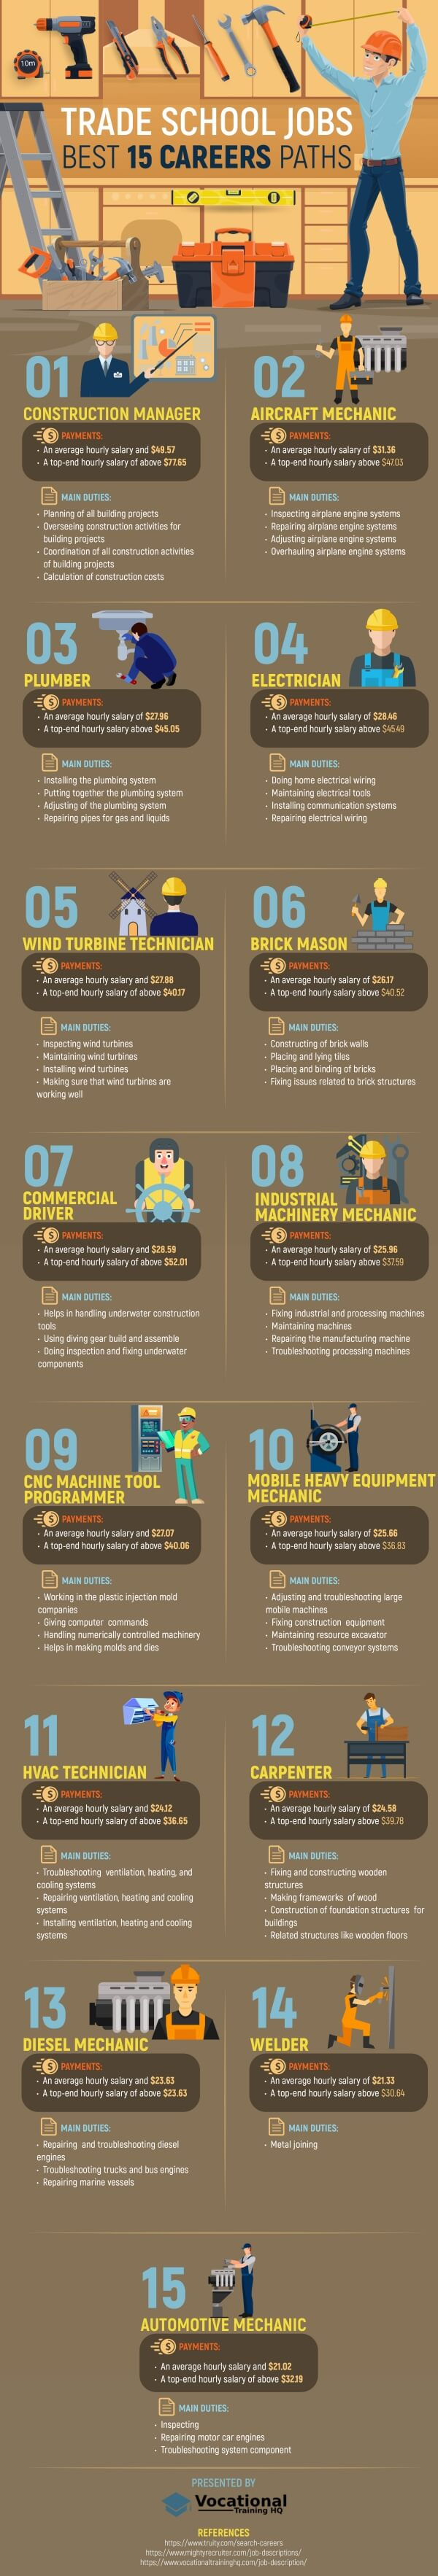 trade-school-jobs-infographic-plaza